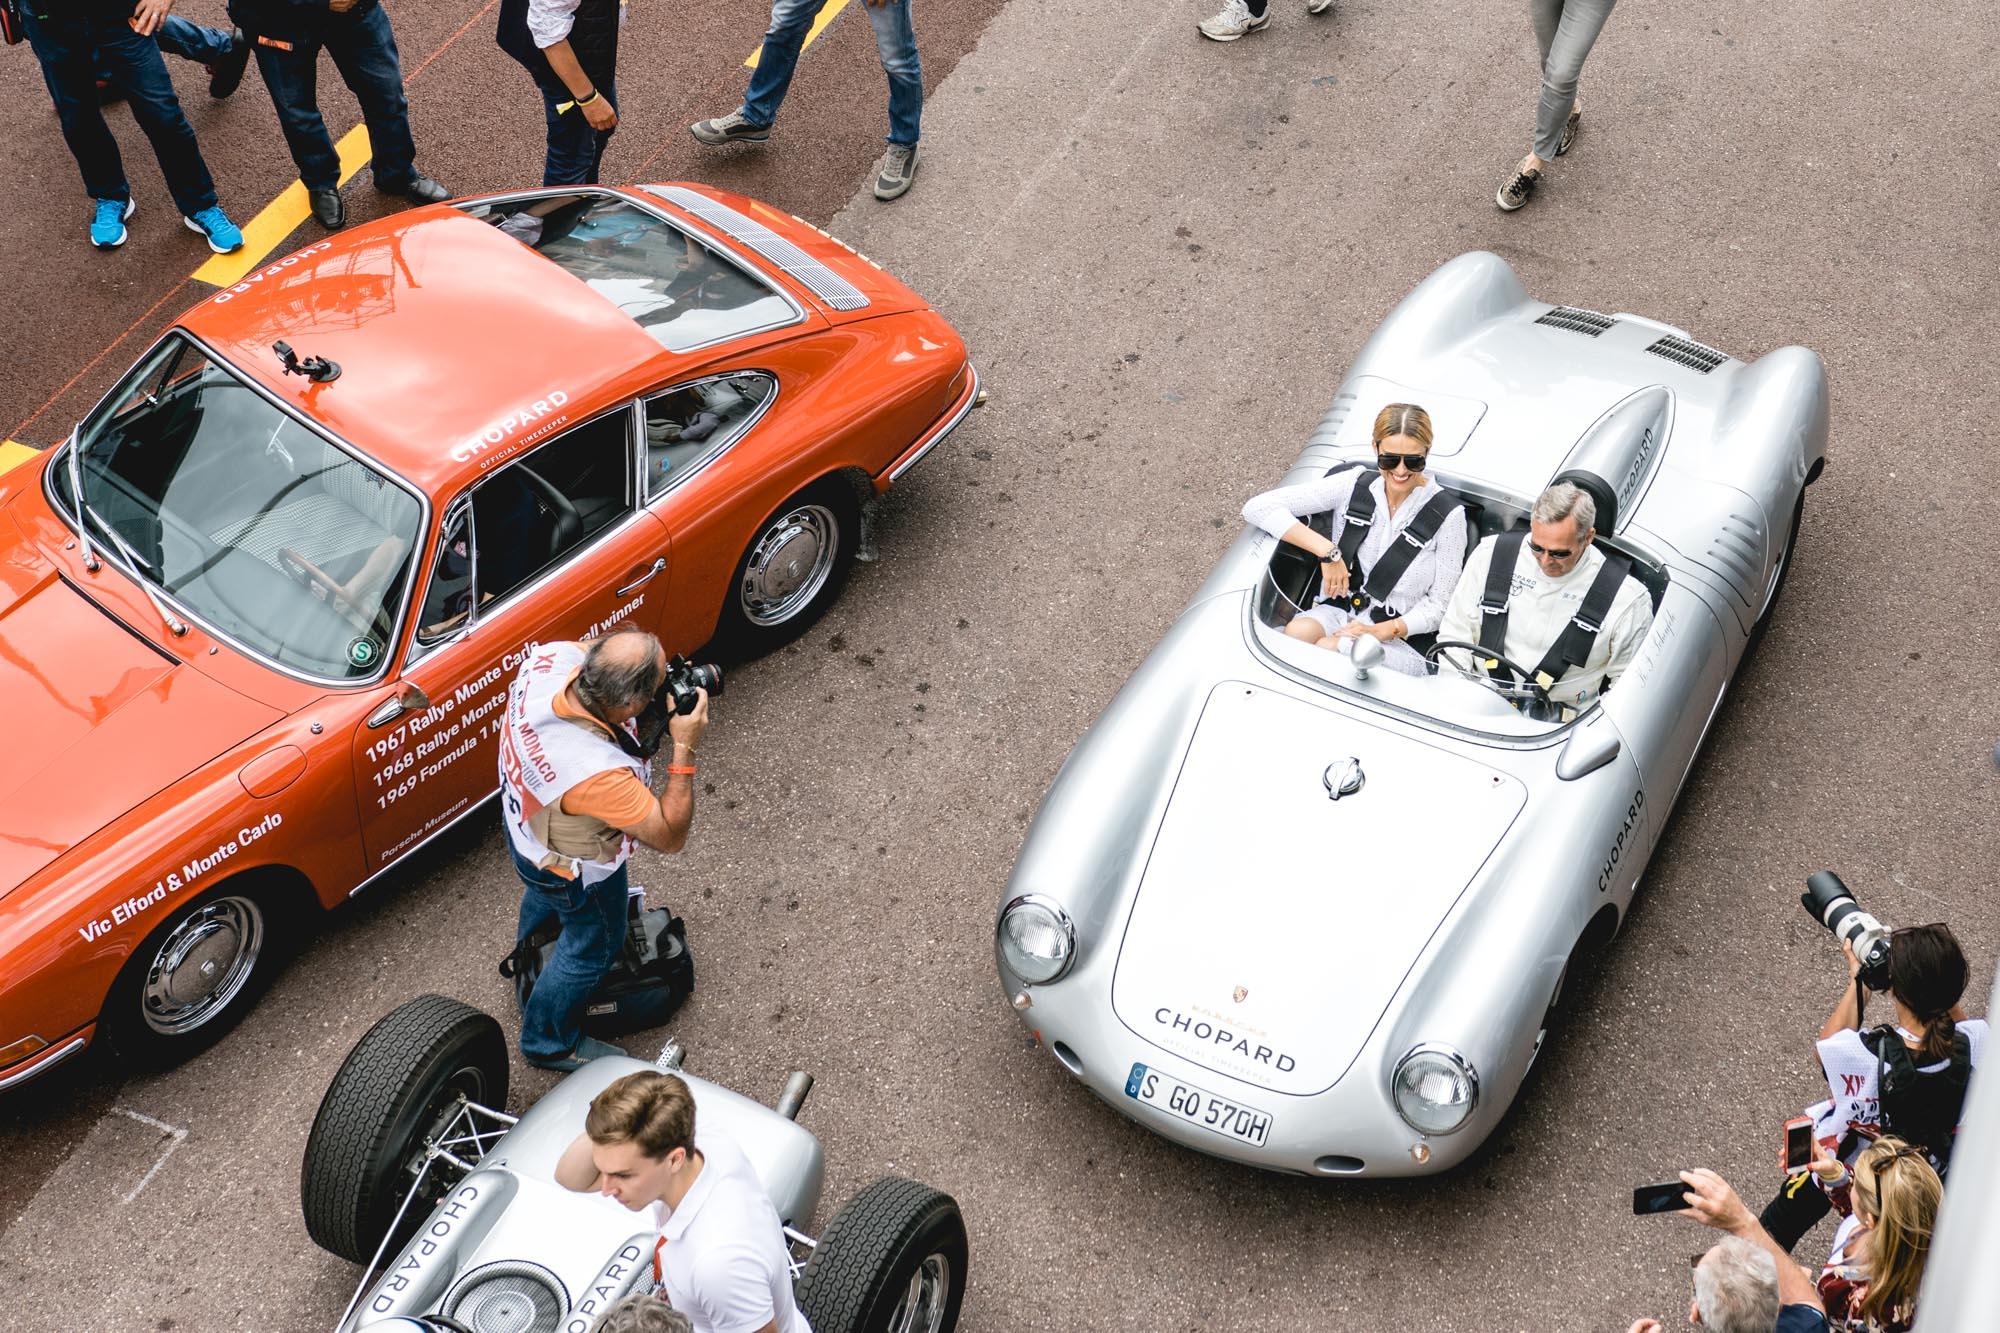 Grand Prix de Monaco Historique - Petra Nemcova et Karl-Friedrich Scheufele